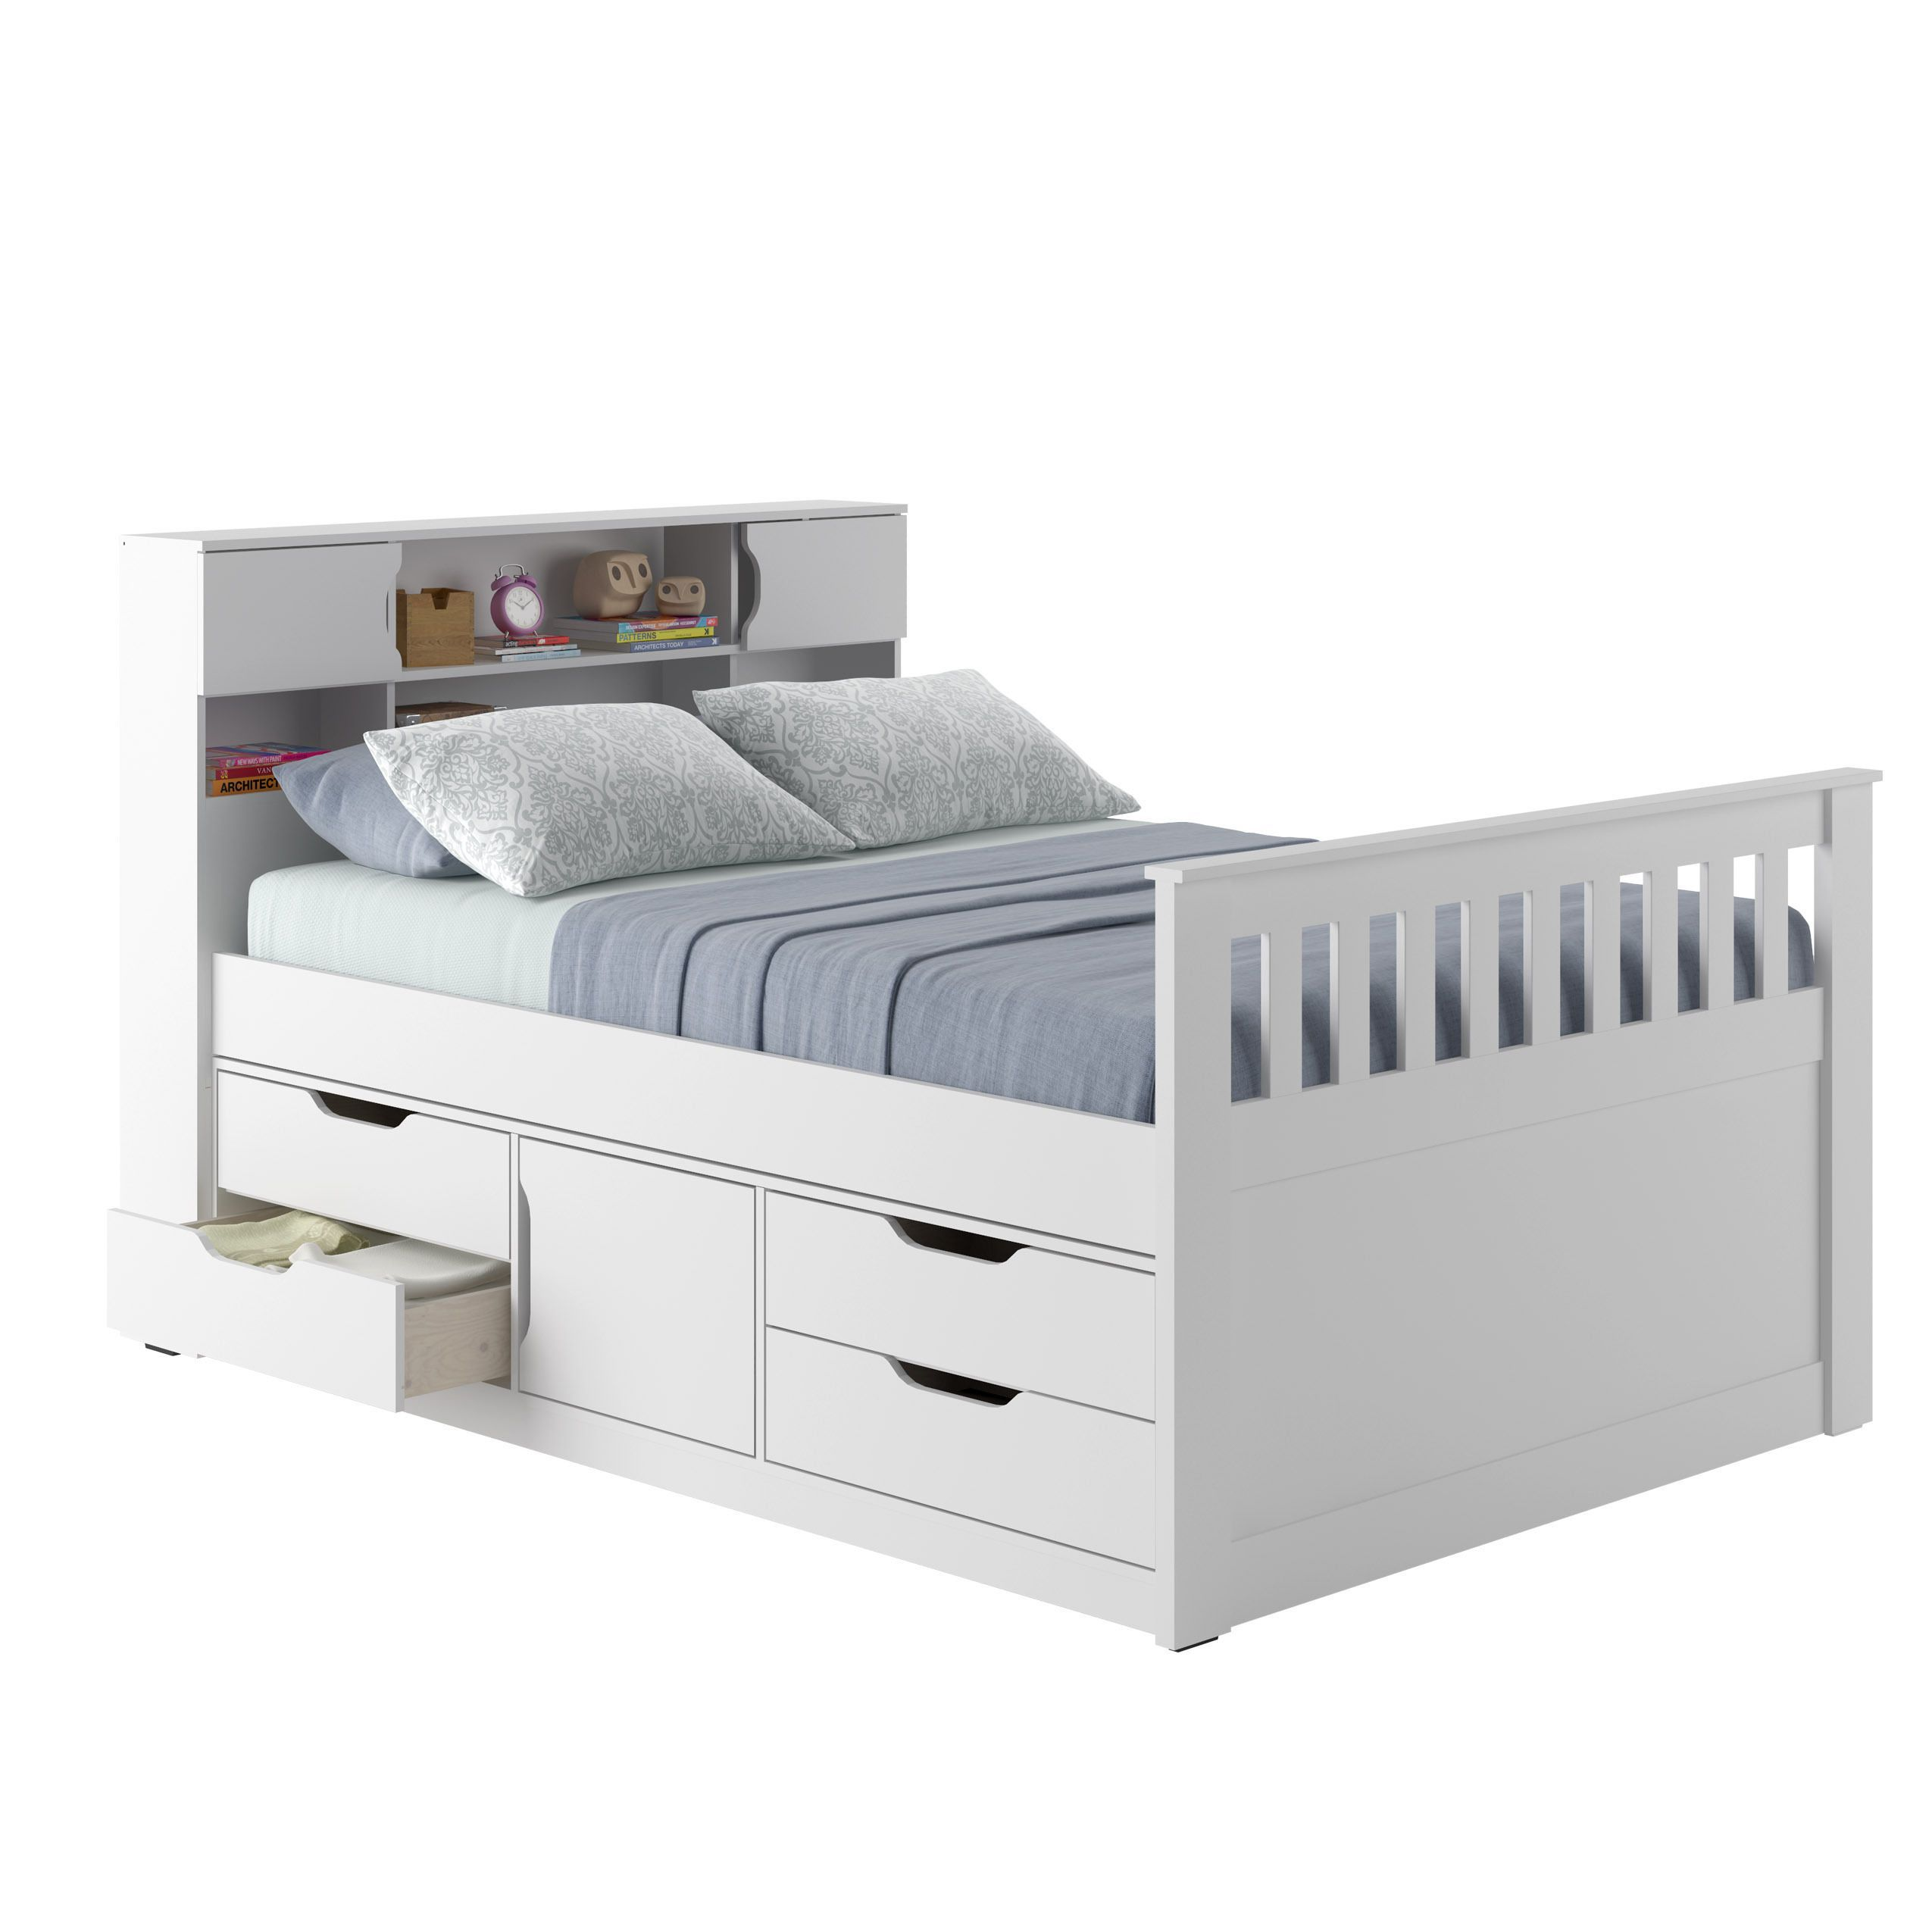 CorLiving Madison Full/Double Captain's Bed (White White